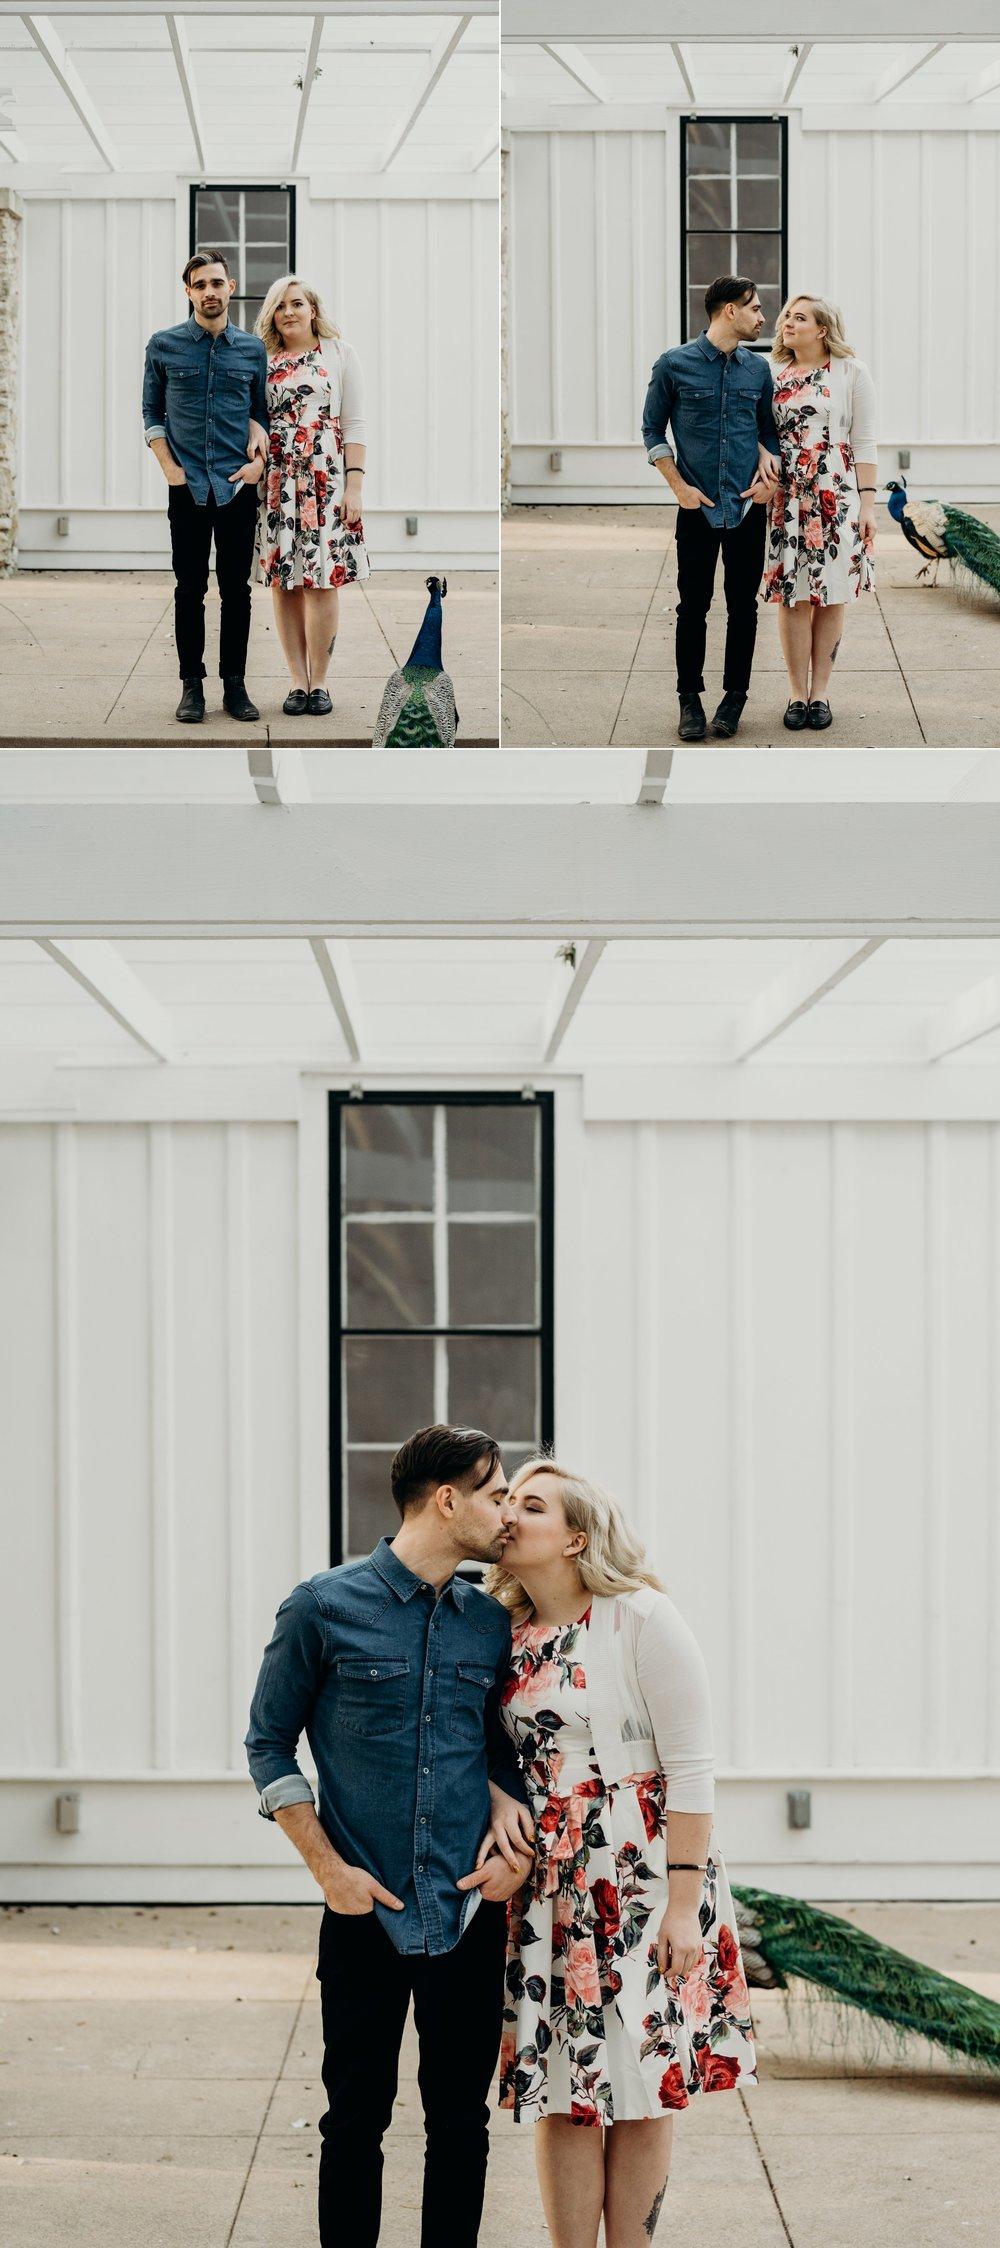 drew-andrew-texas-austin-minnesota-minneapolis-wedding-photographer-destination-elopement-intimate-adventurous_0085.jpg